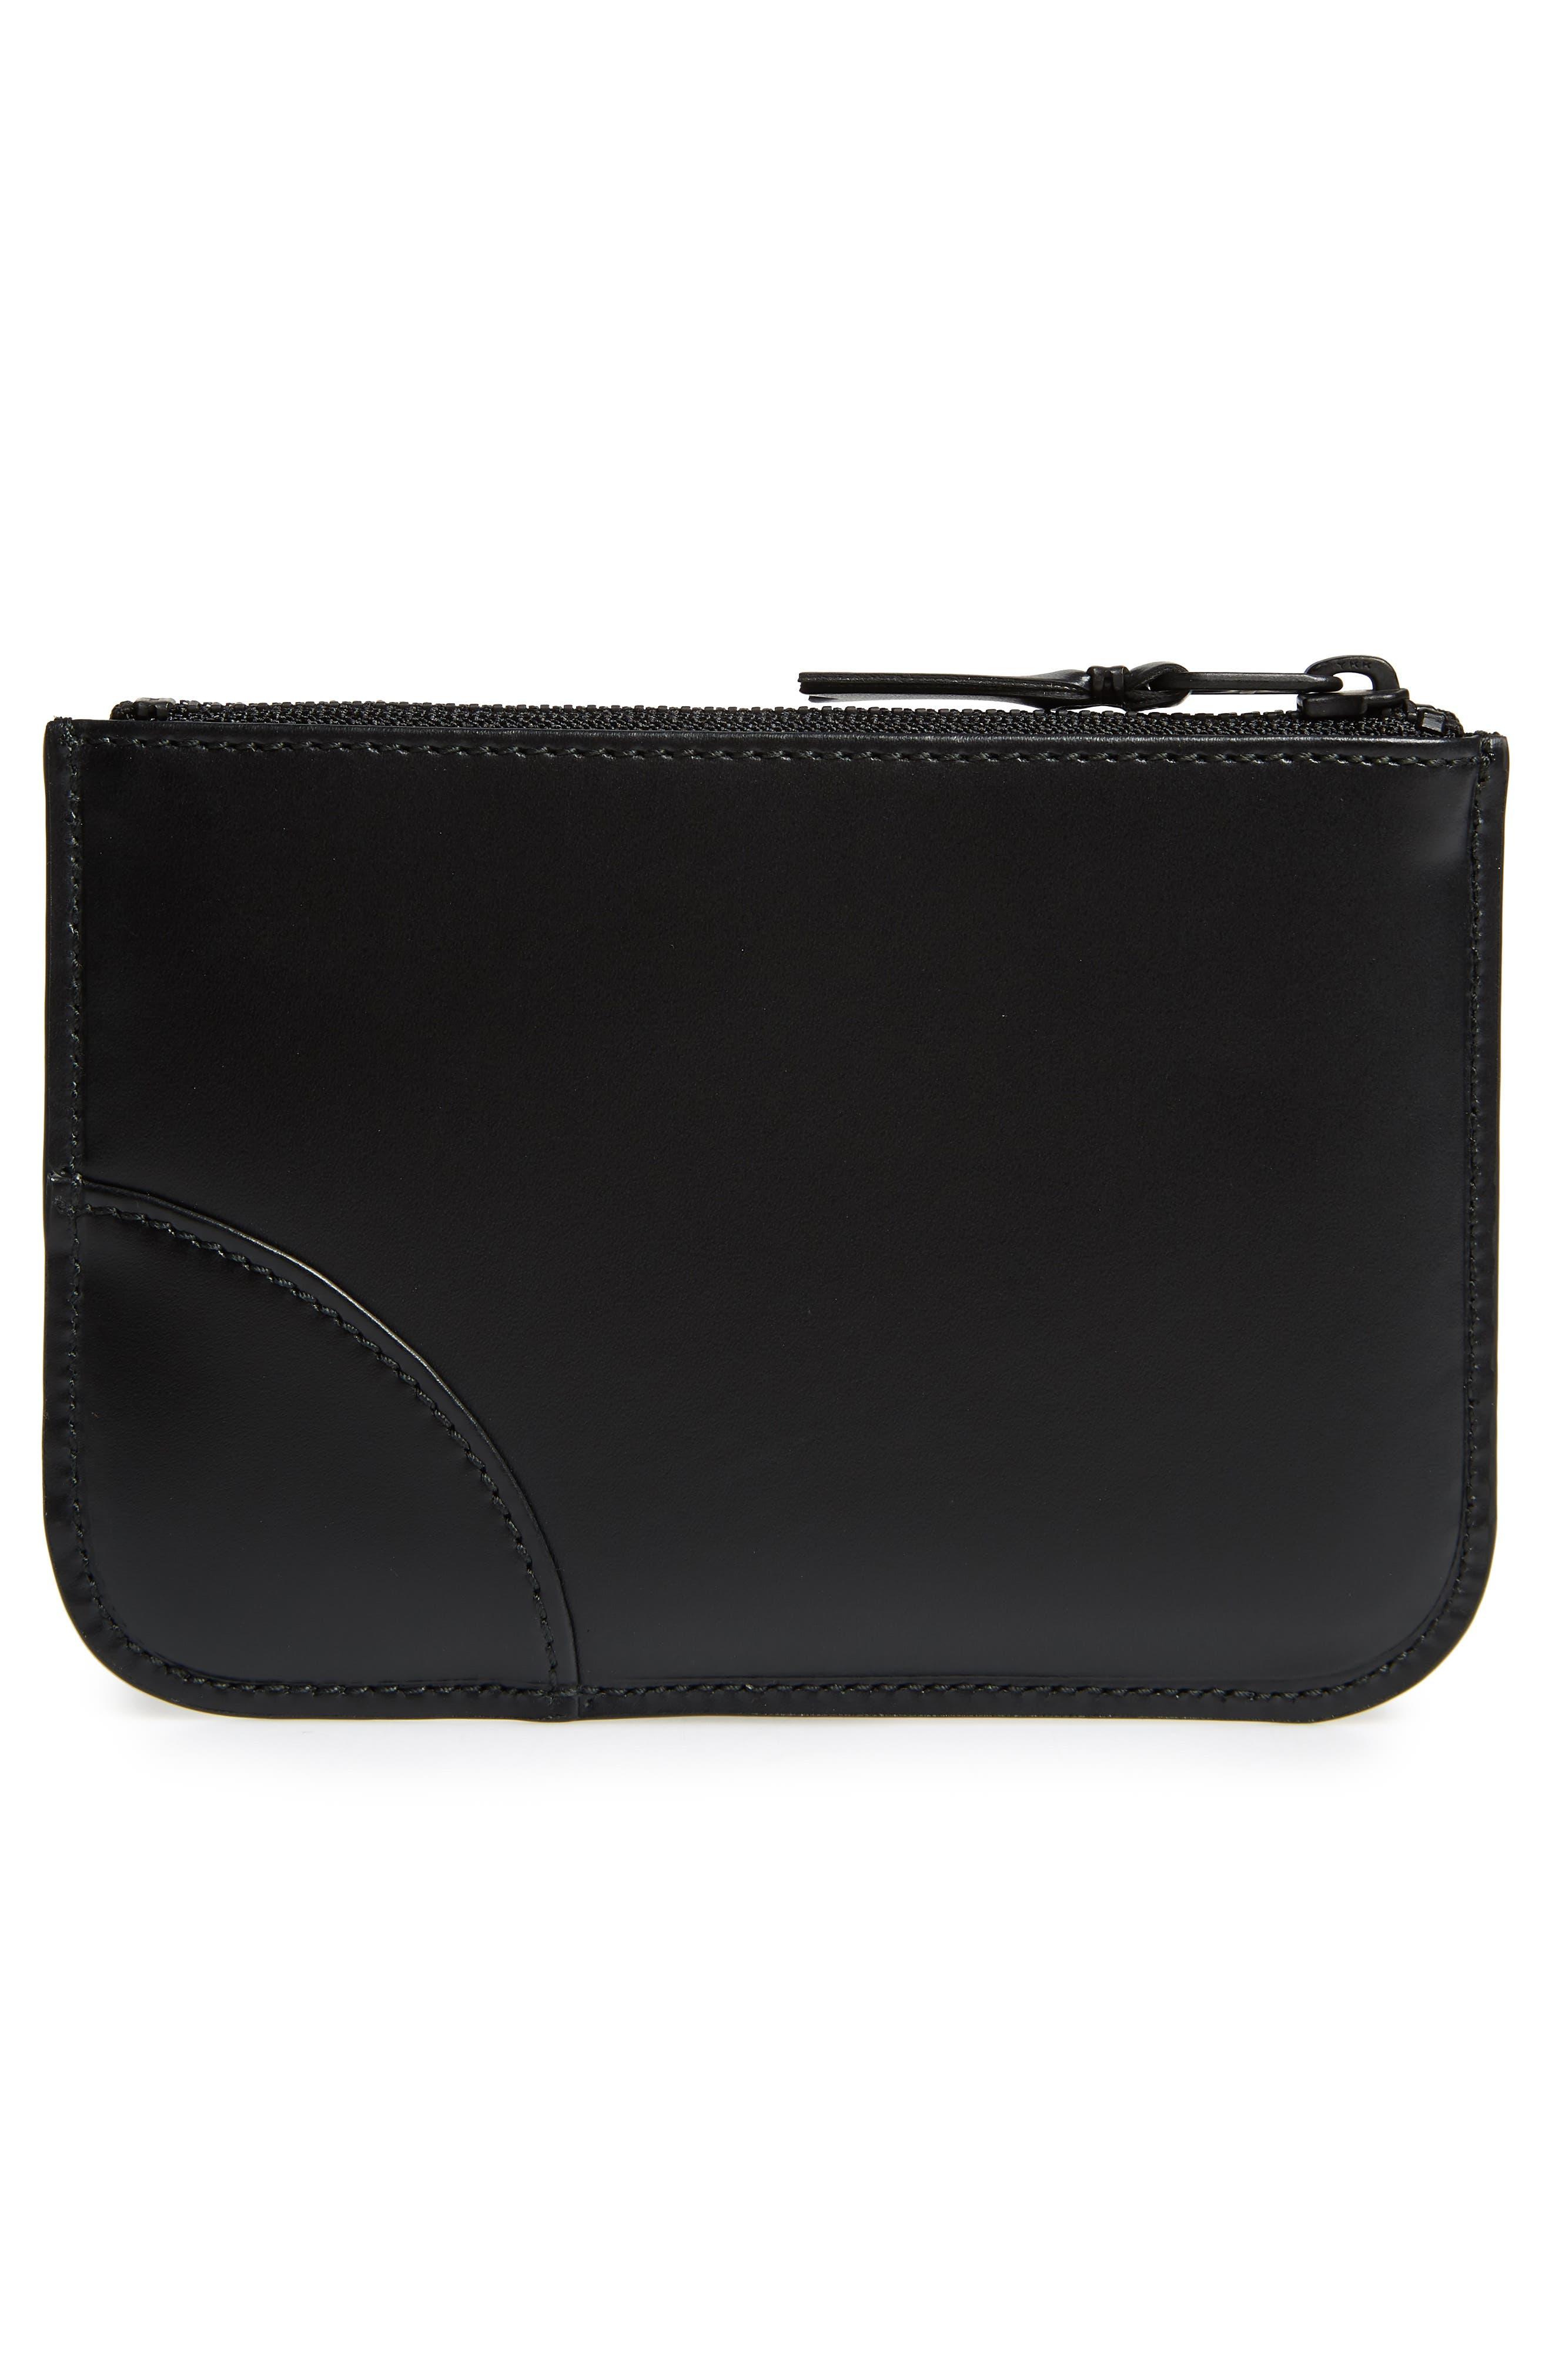 Very Black Leather Line Wallet,                             Alternate thumbnail 3, color,                             BLACK